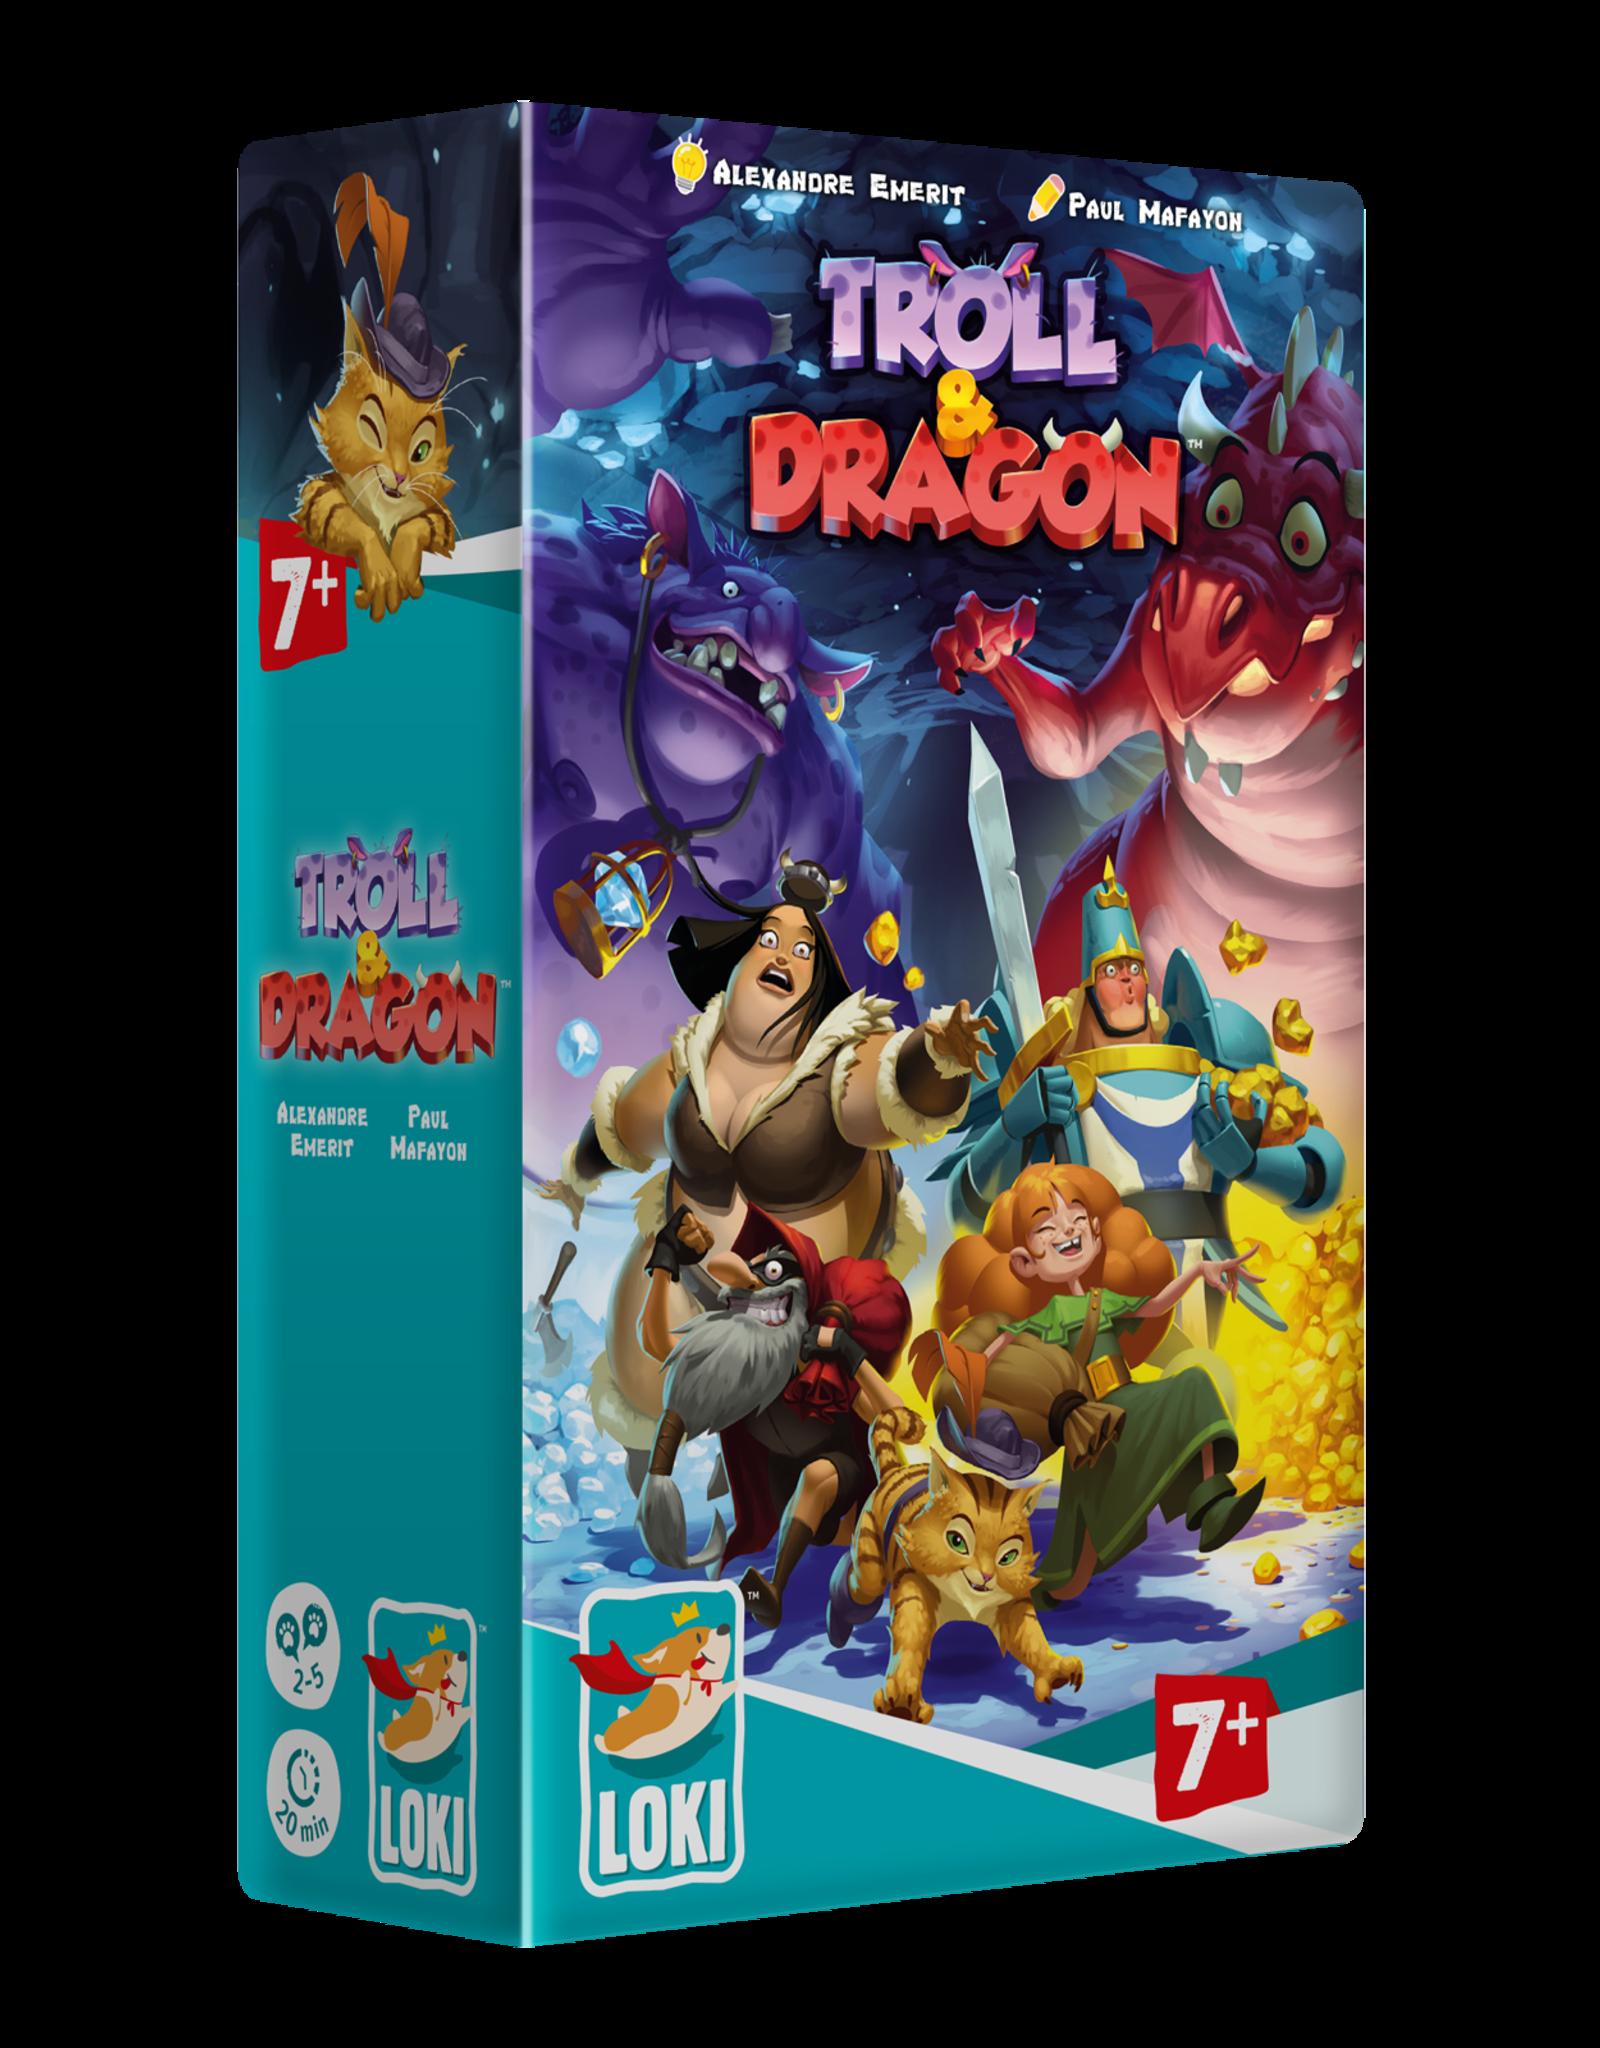 LOKI Troll and Dragon